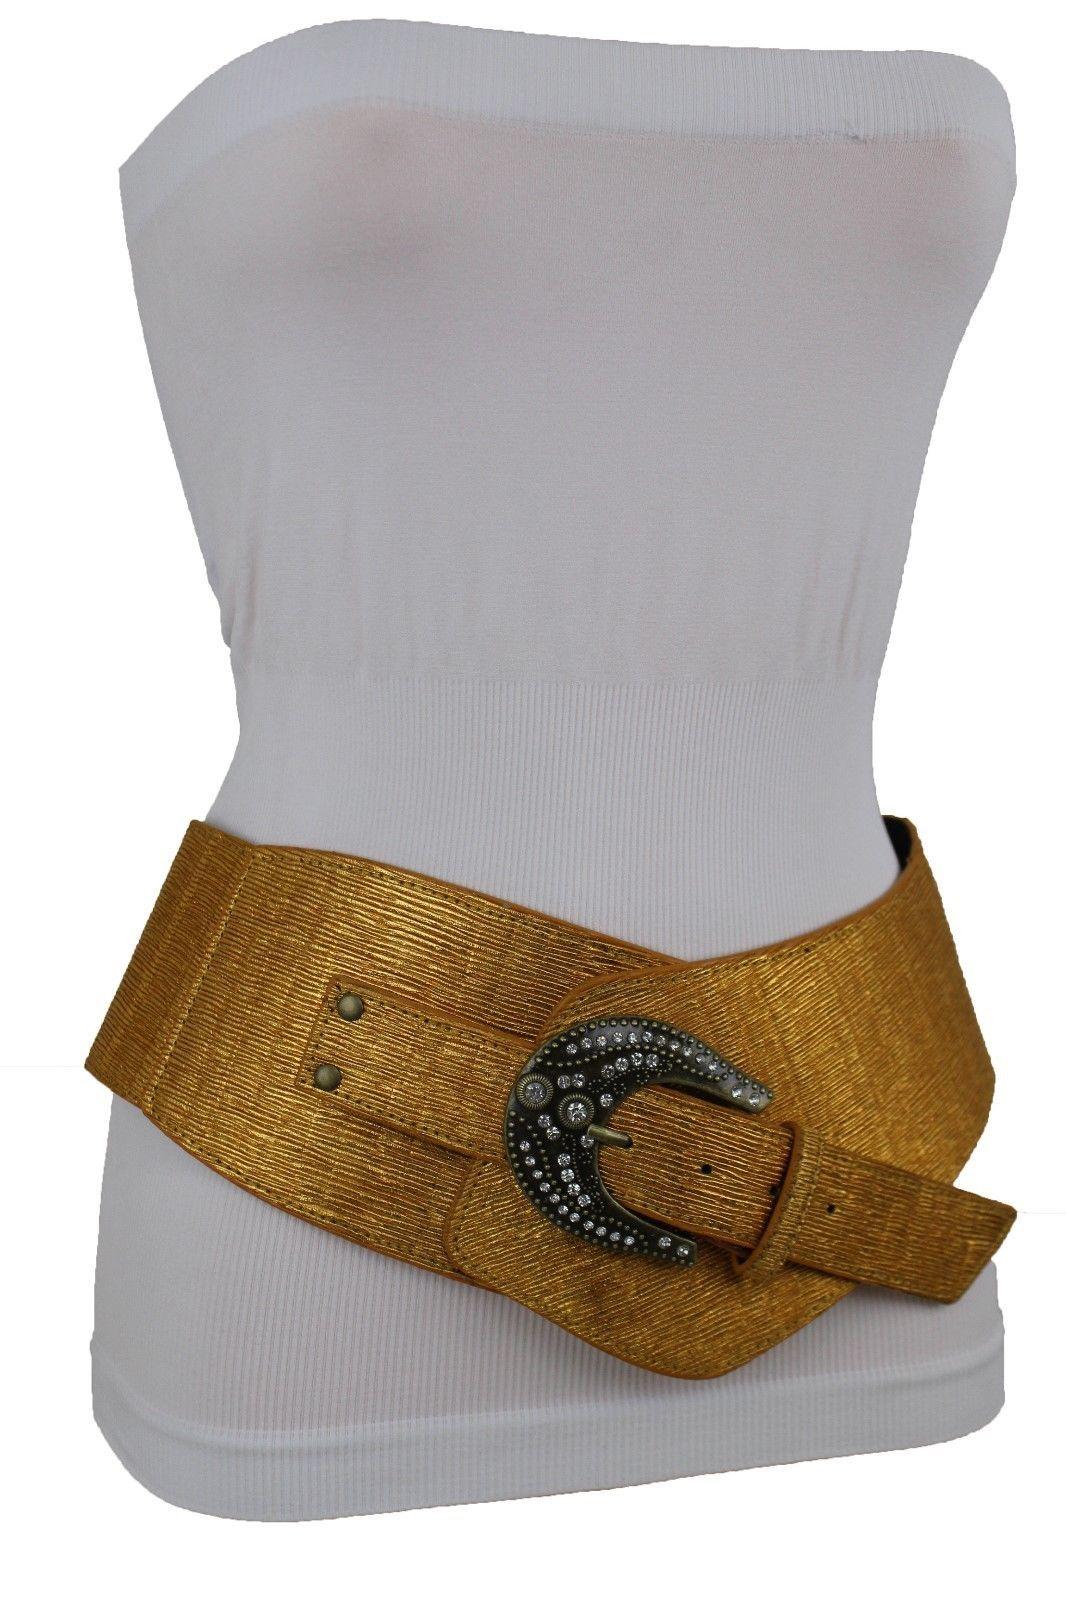 Damen Extra Breit Band West Gürtel Hüfte Taille Metallic Gold Color Plus